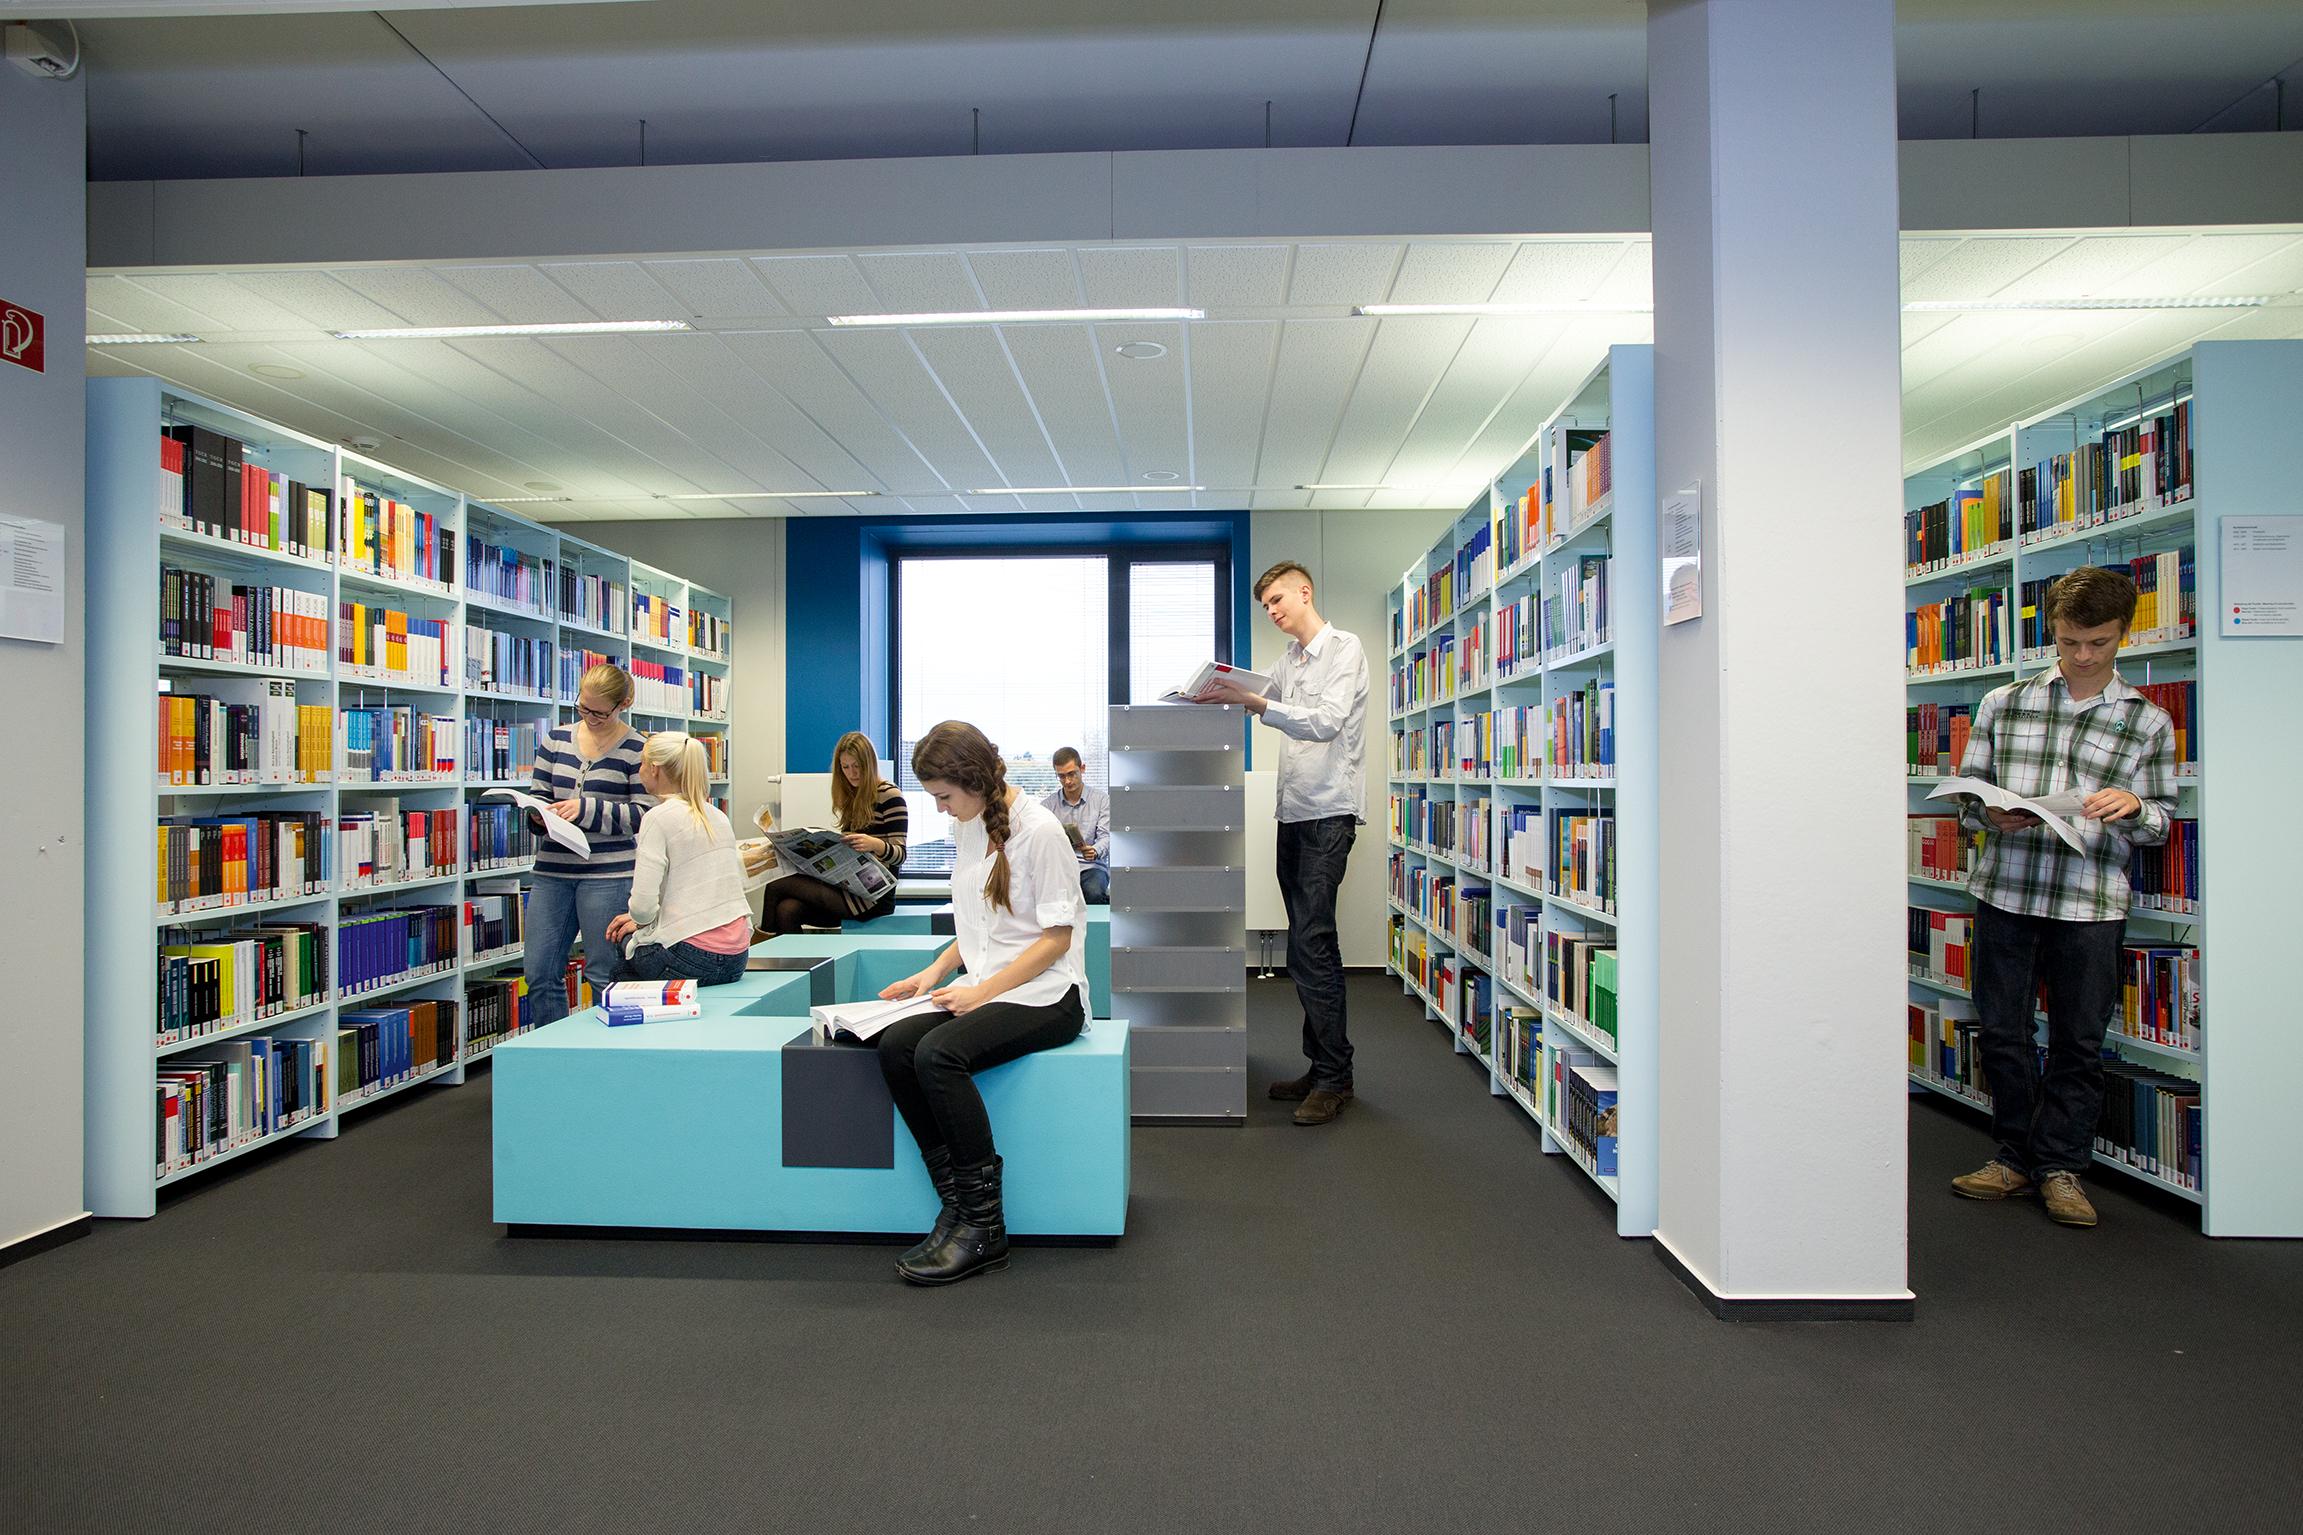 bibliothek hochschule rhein waal. Black Bedroom Furniture Sets. Home Design Ideas